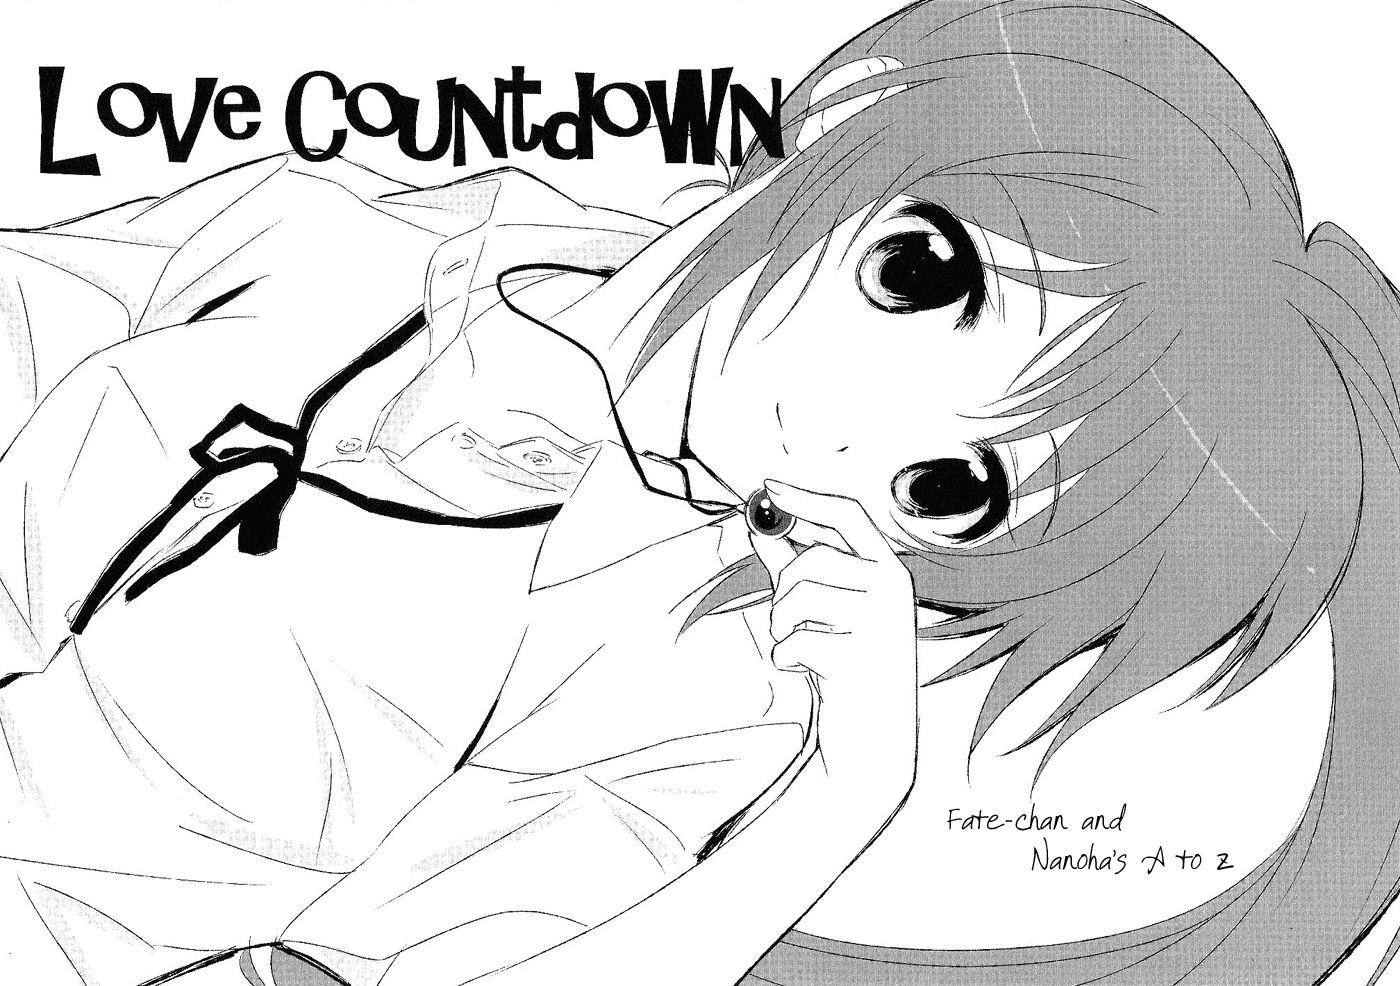 Nanoha dj - Love Countdown 1 Page 1